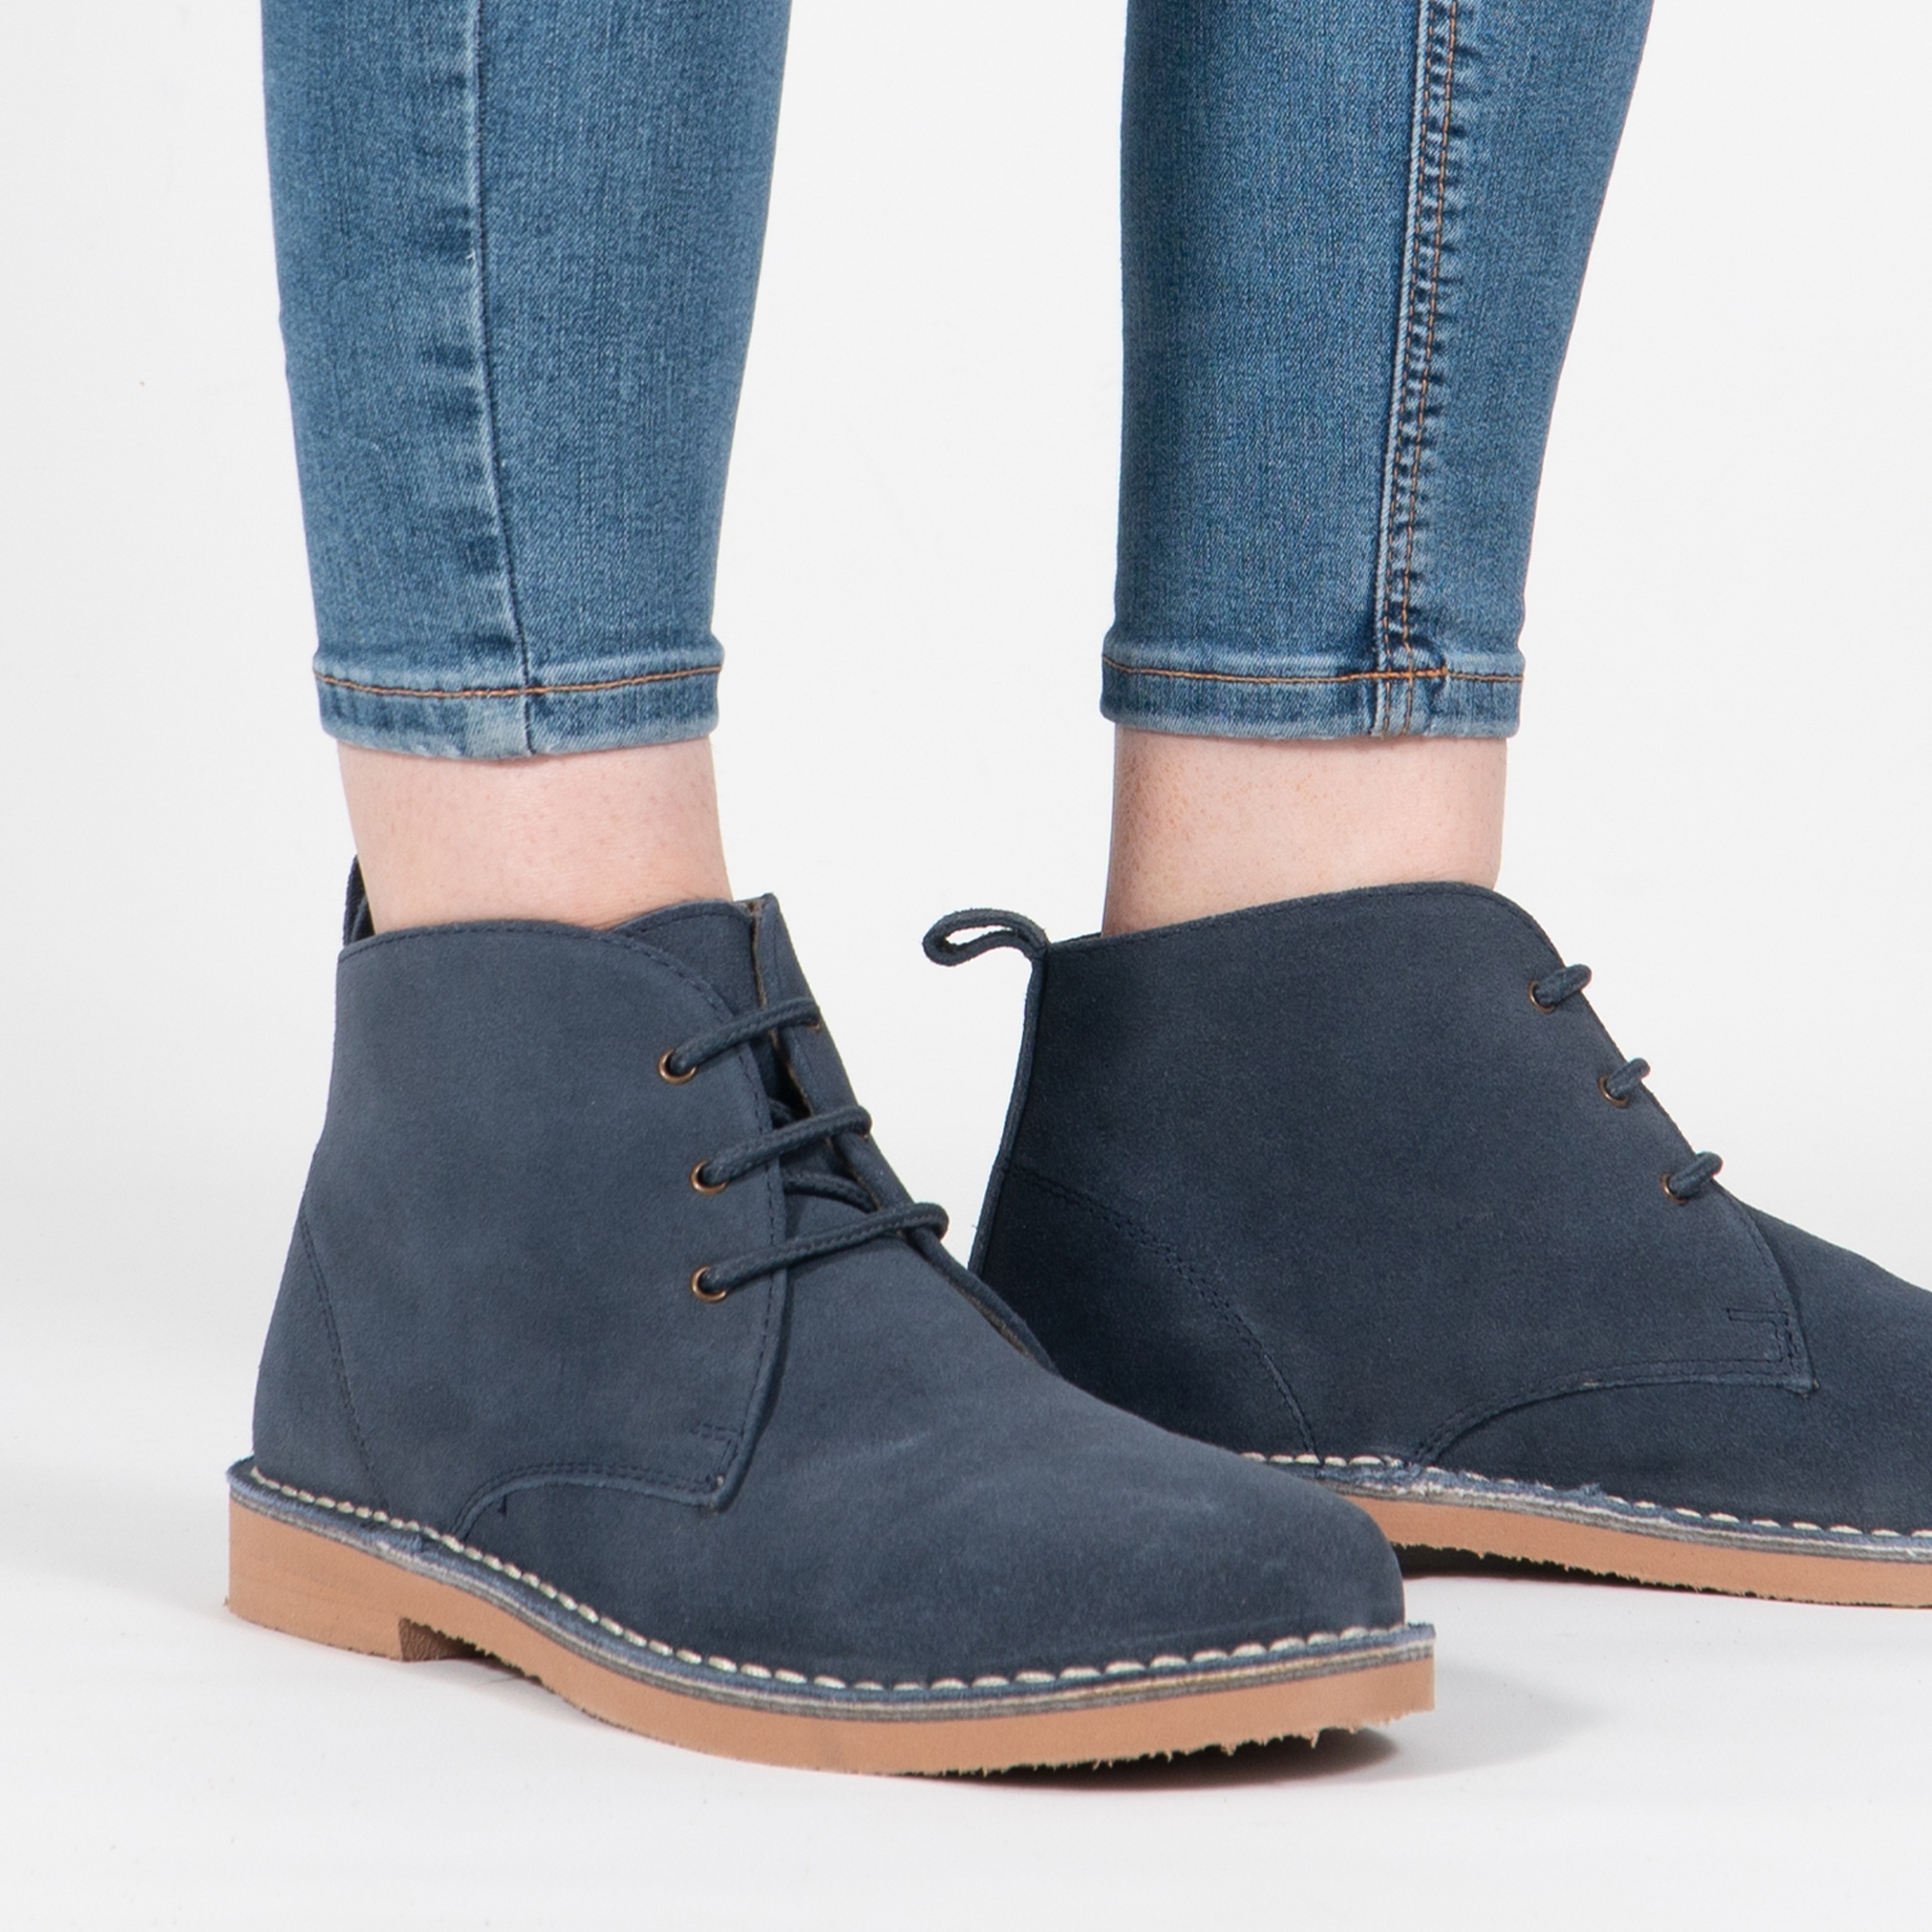 Roamers TRACY Ladies Blue Desert Boots